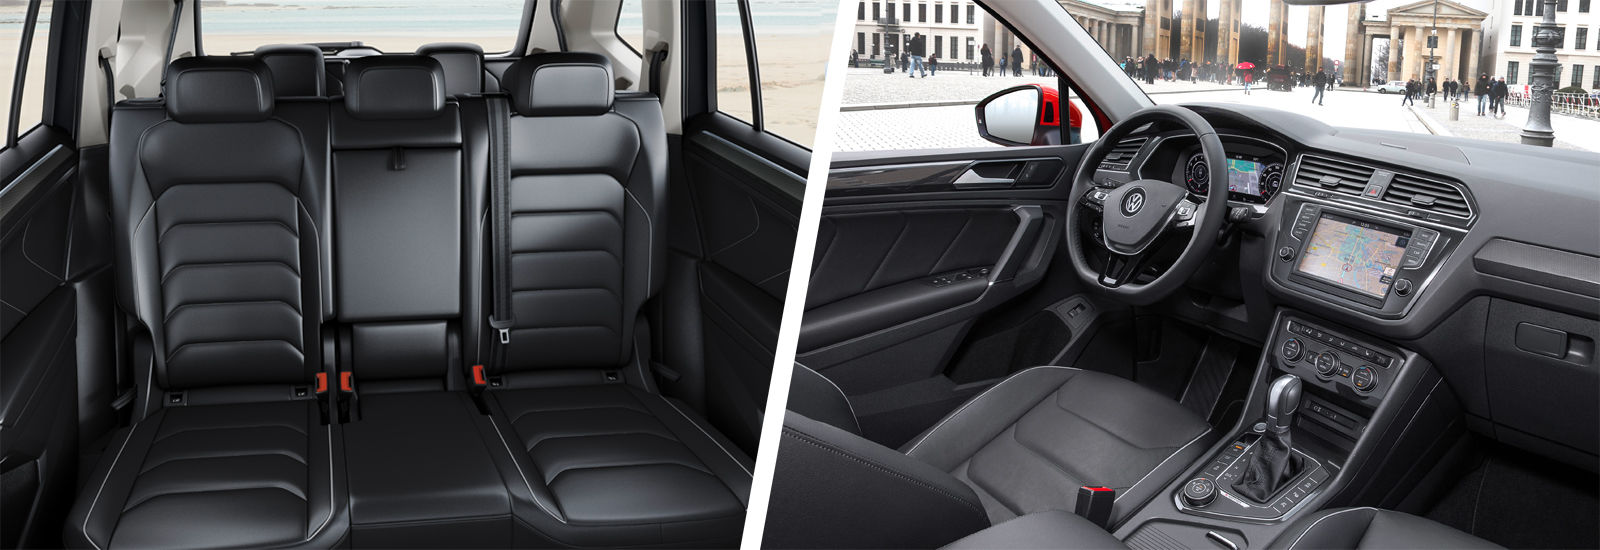 VW Tiguan Allspace 7 Seater Vs 5 Carwow